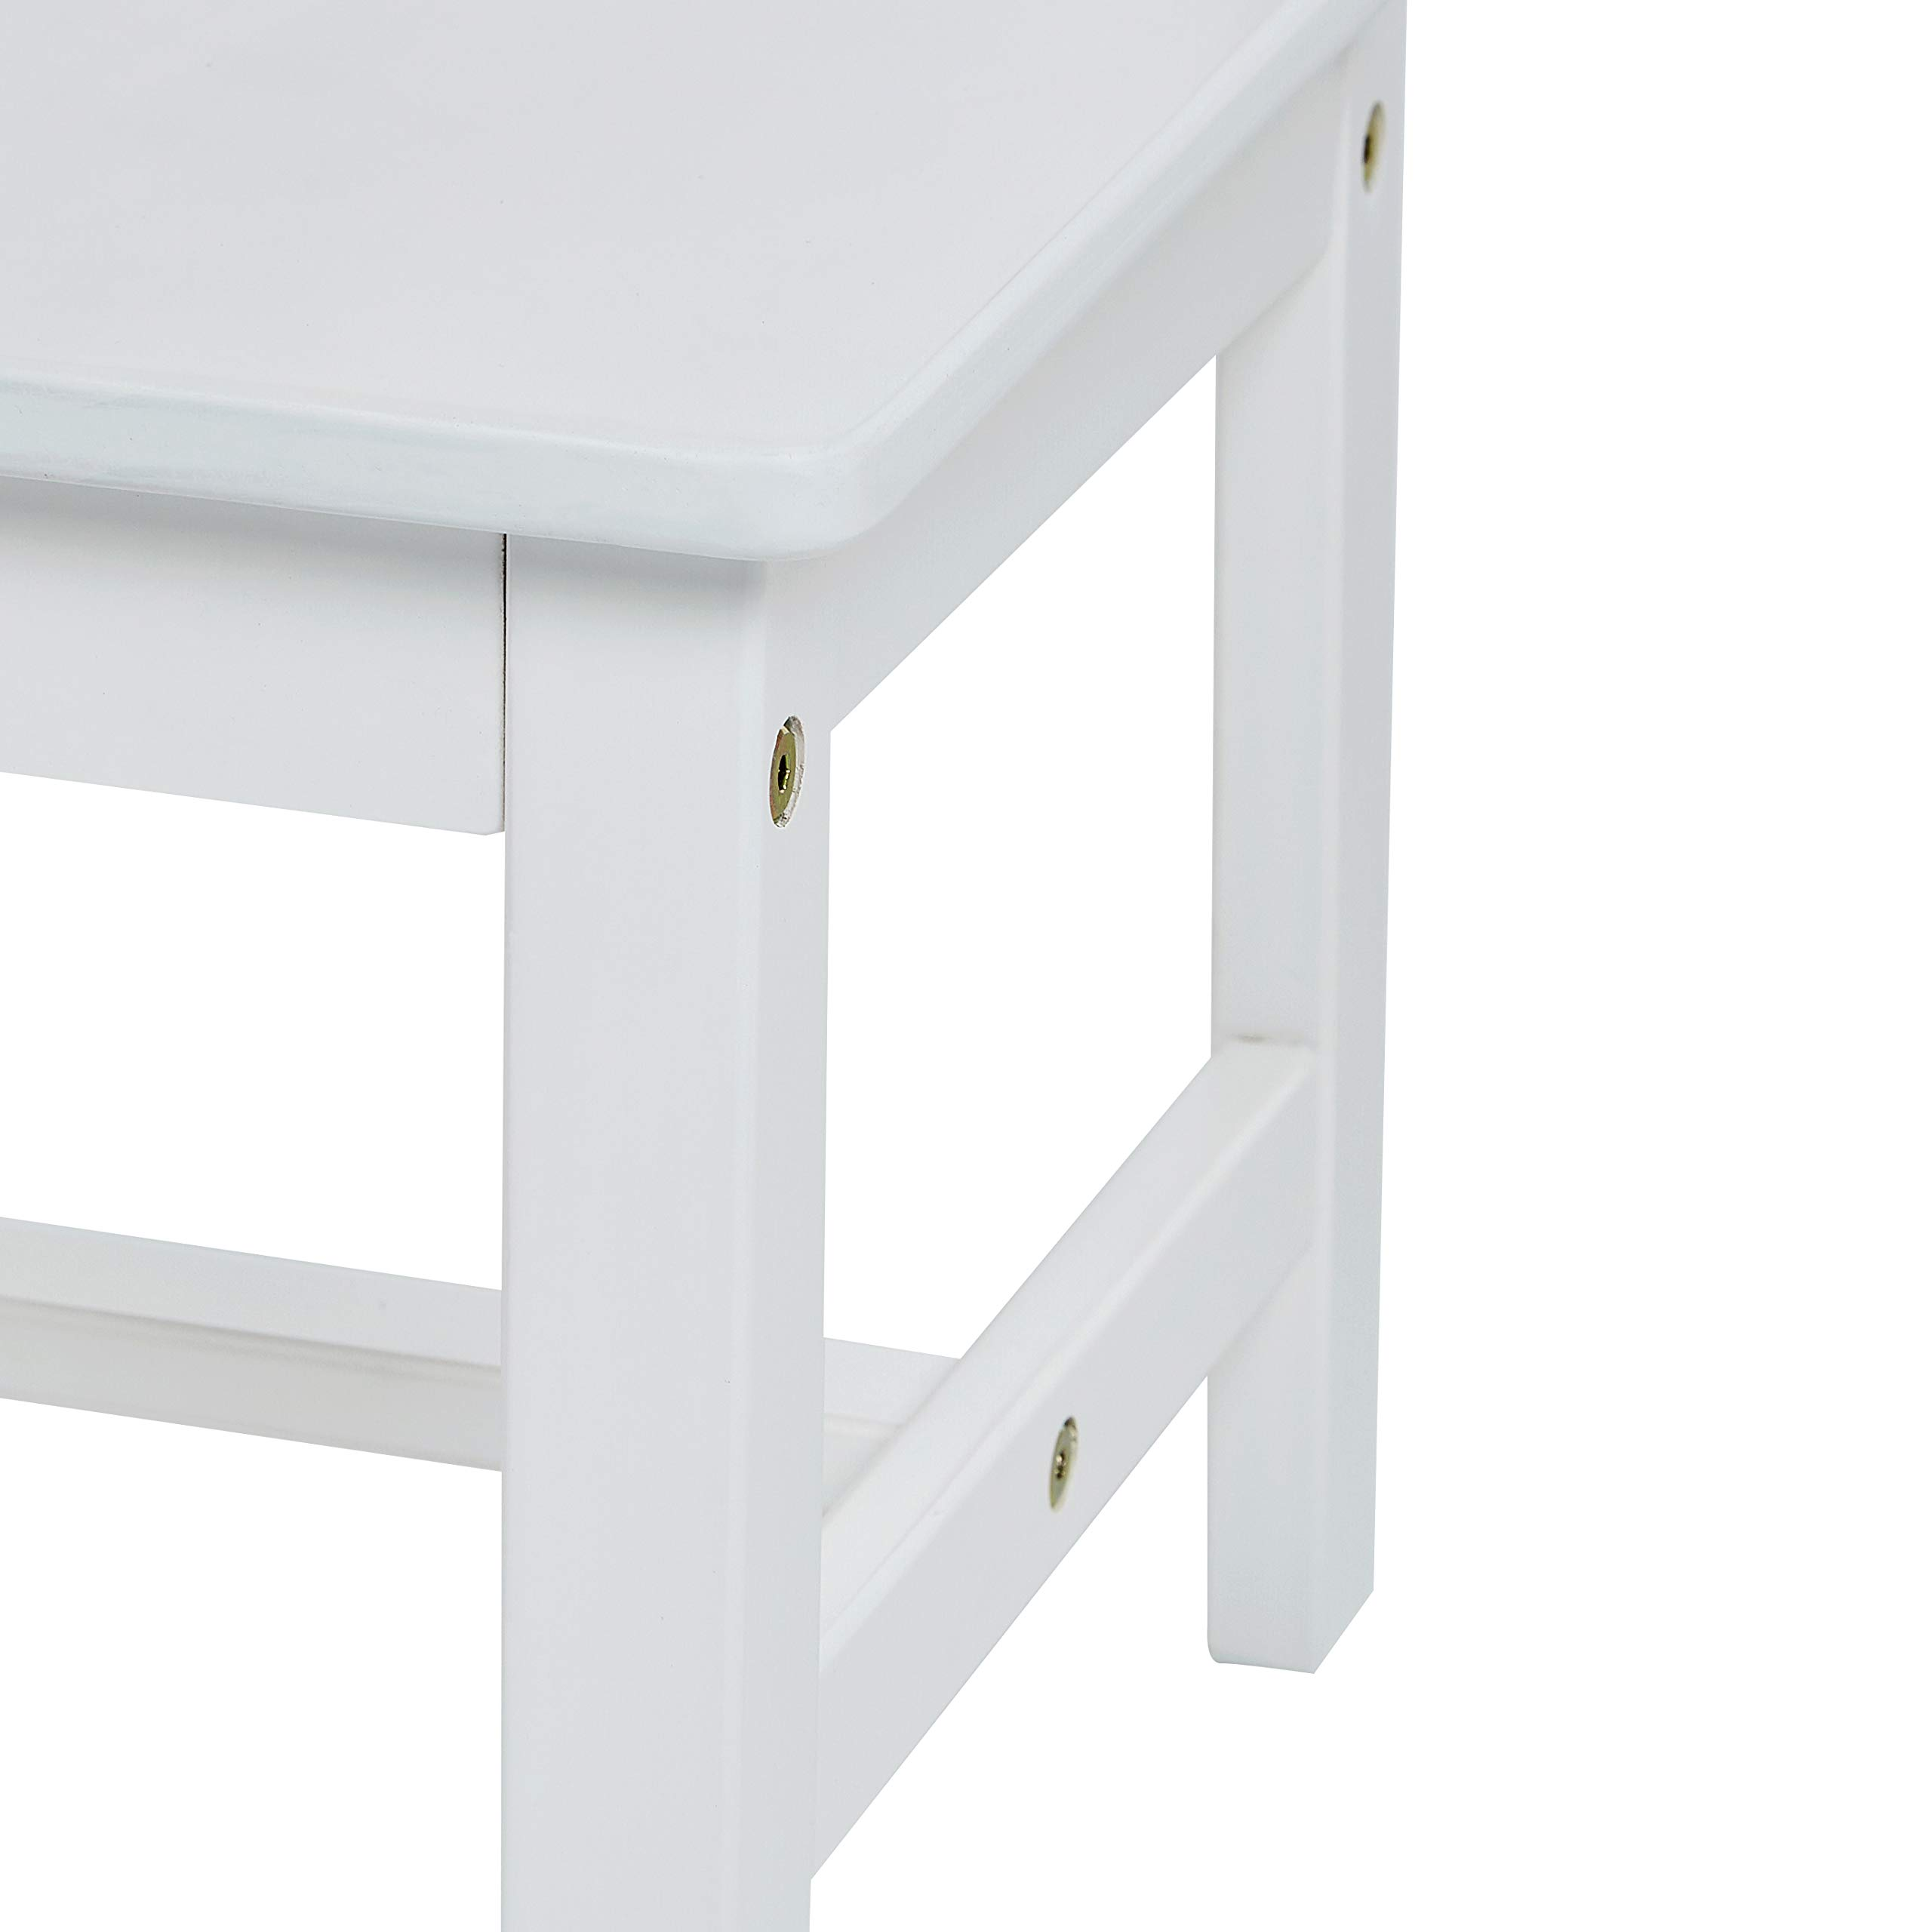 AmazonBasics Kids Solid Wood Table and 2 Chair Set, White by AmazonBasics (Image #5)